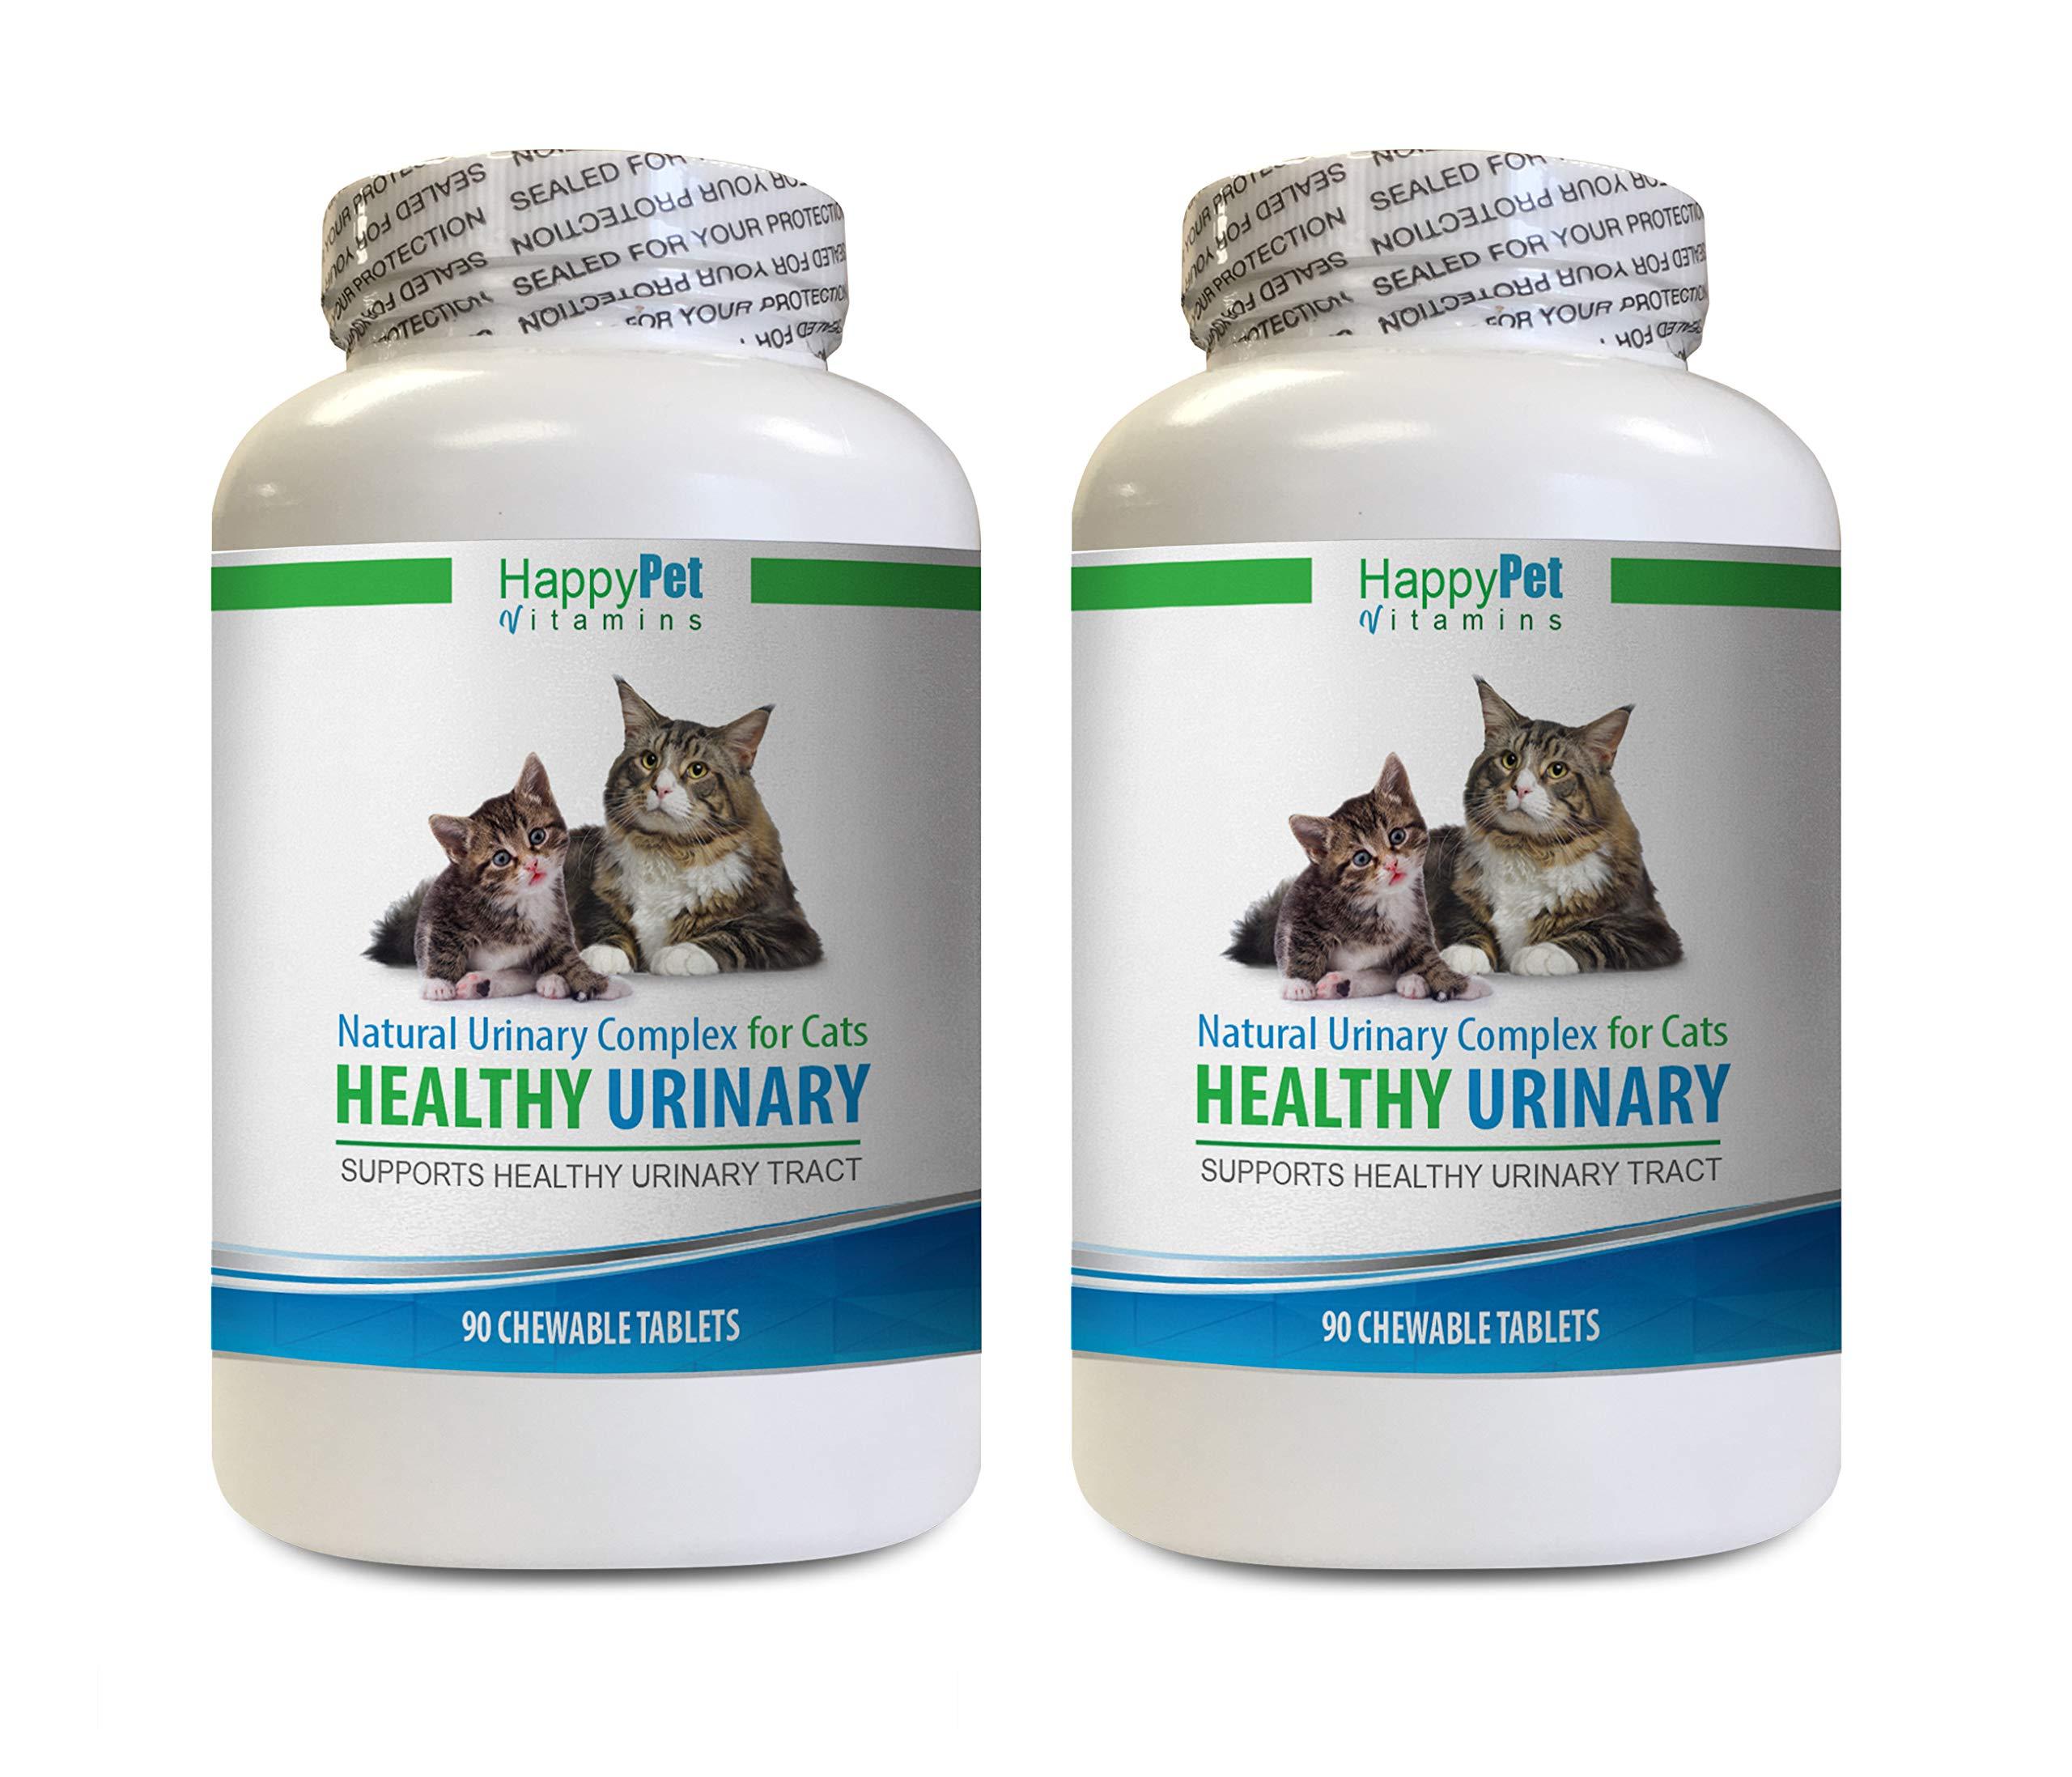 HAPPY PET VITAMINS LLC cat Bladder Strength - CAT Healthy Urinary Complex - UTI Solution - Natural Formula - Anti INFLAMMATORY - cat Urinary Care - 2 Bottles (180 Tablets) by HAPPY PET VITAMINS LLC